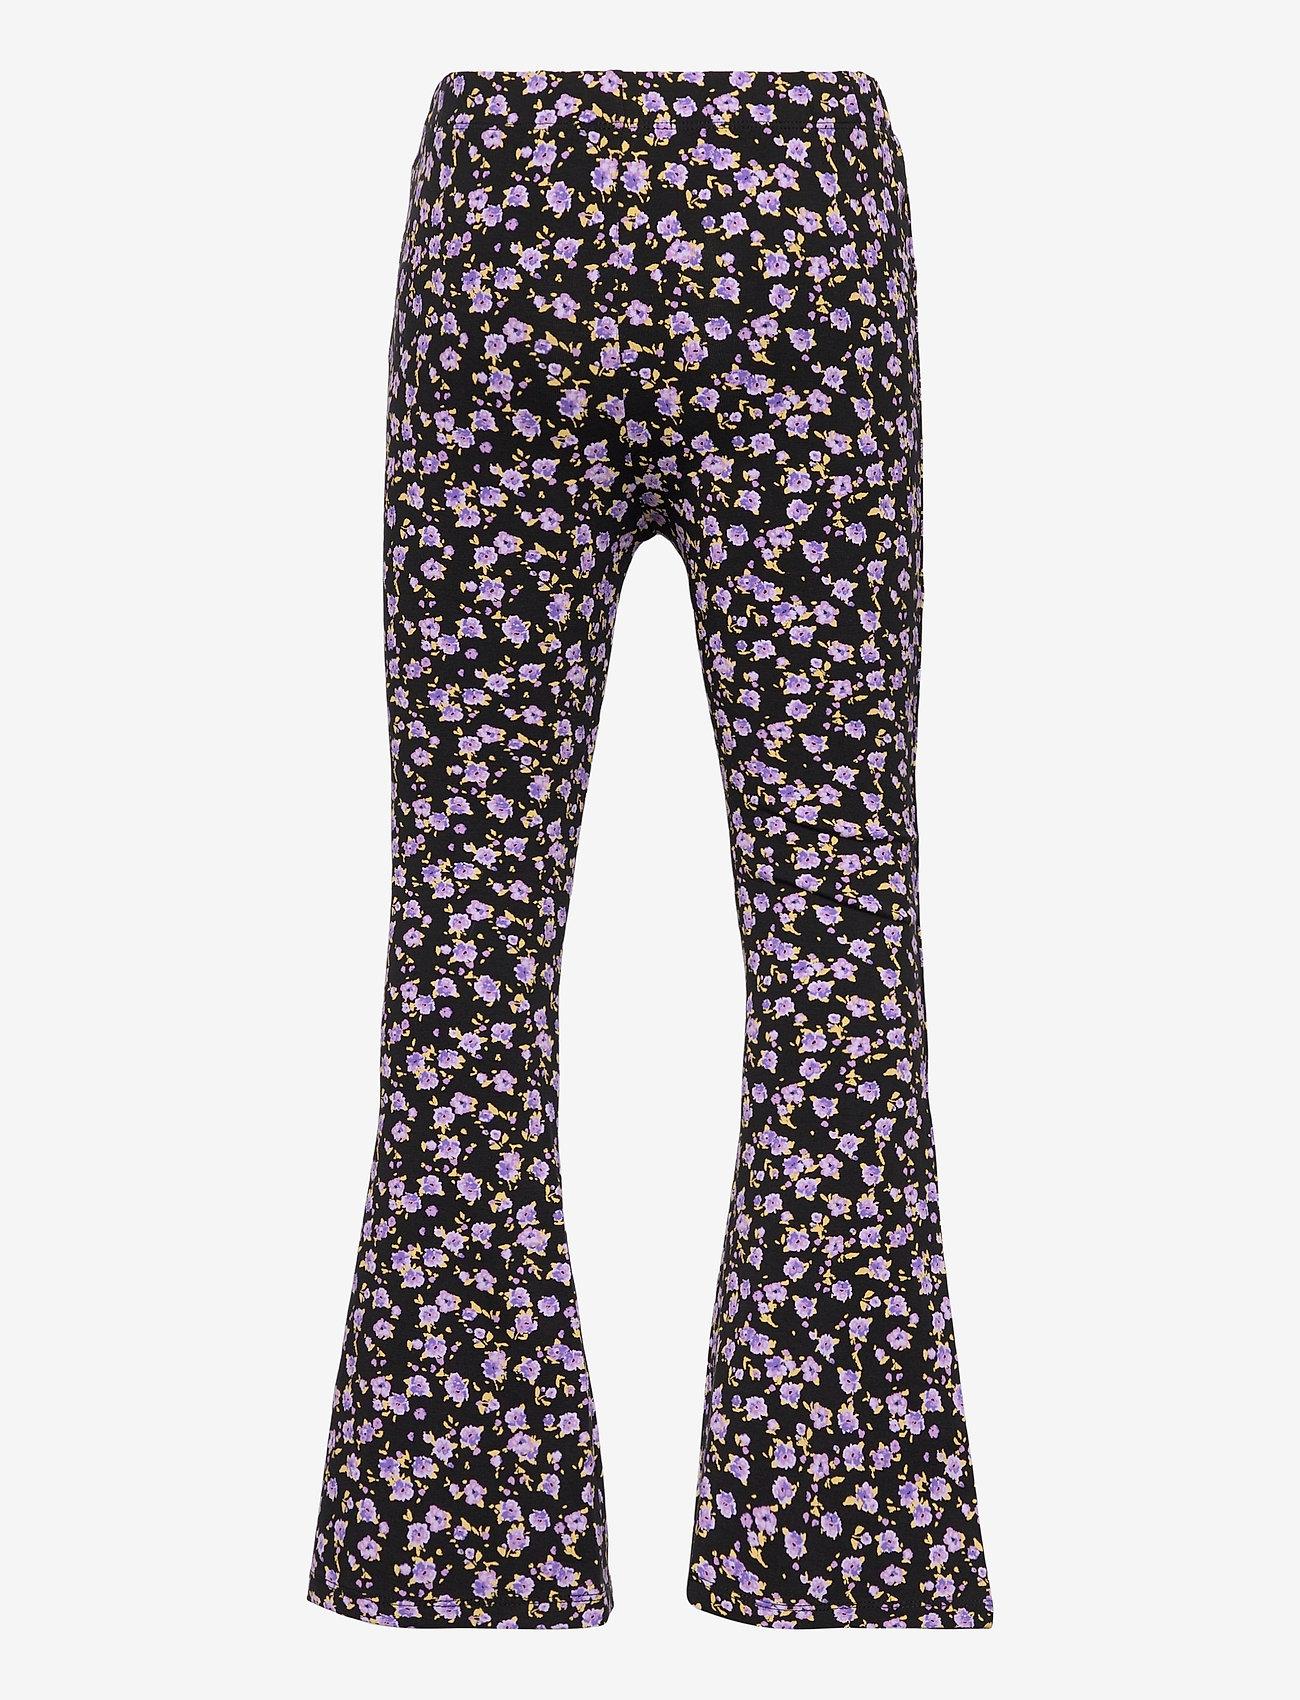 Lindex - Trousers Carmen flares - trousers - black - 1